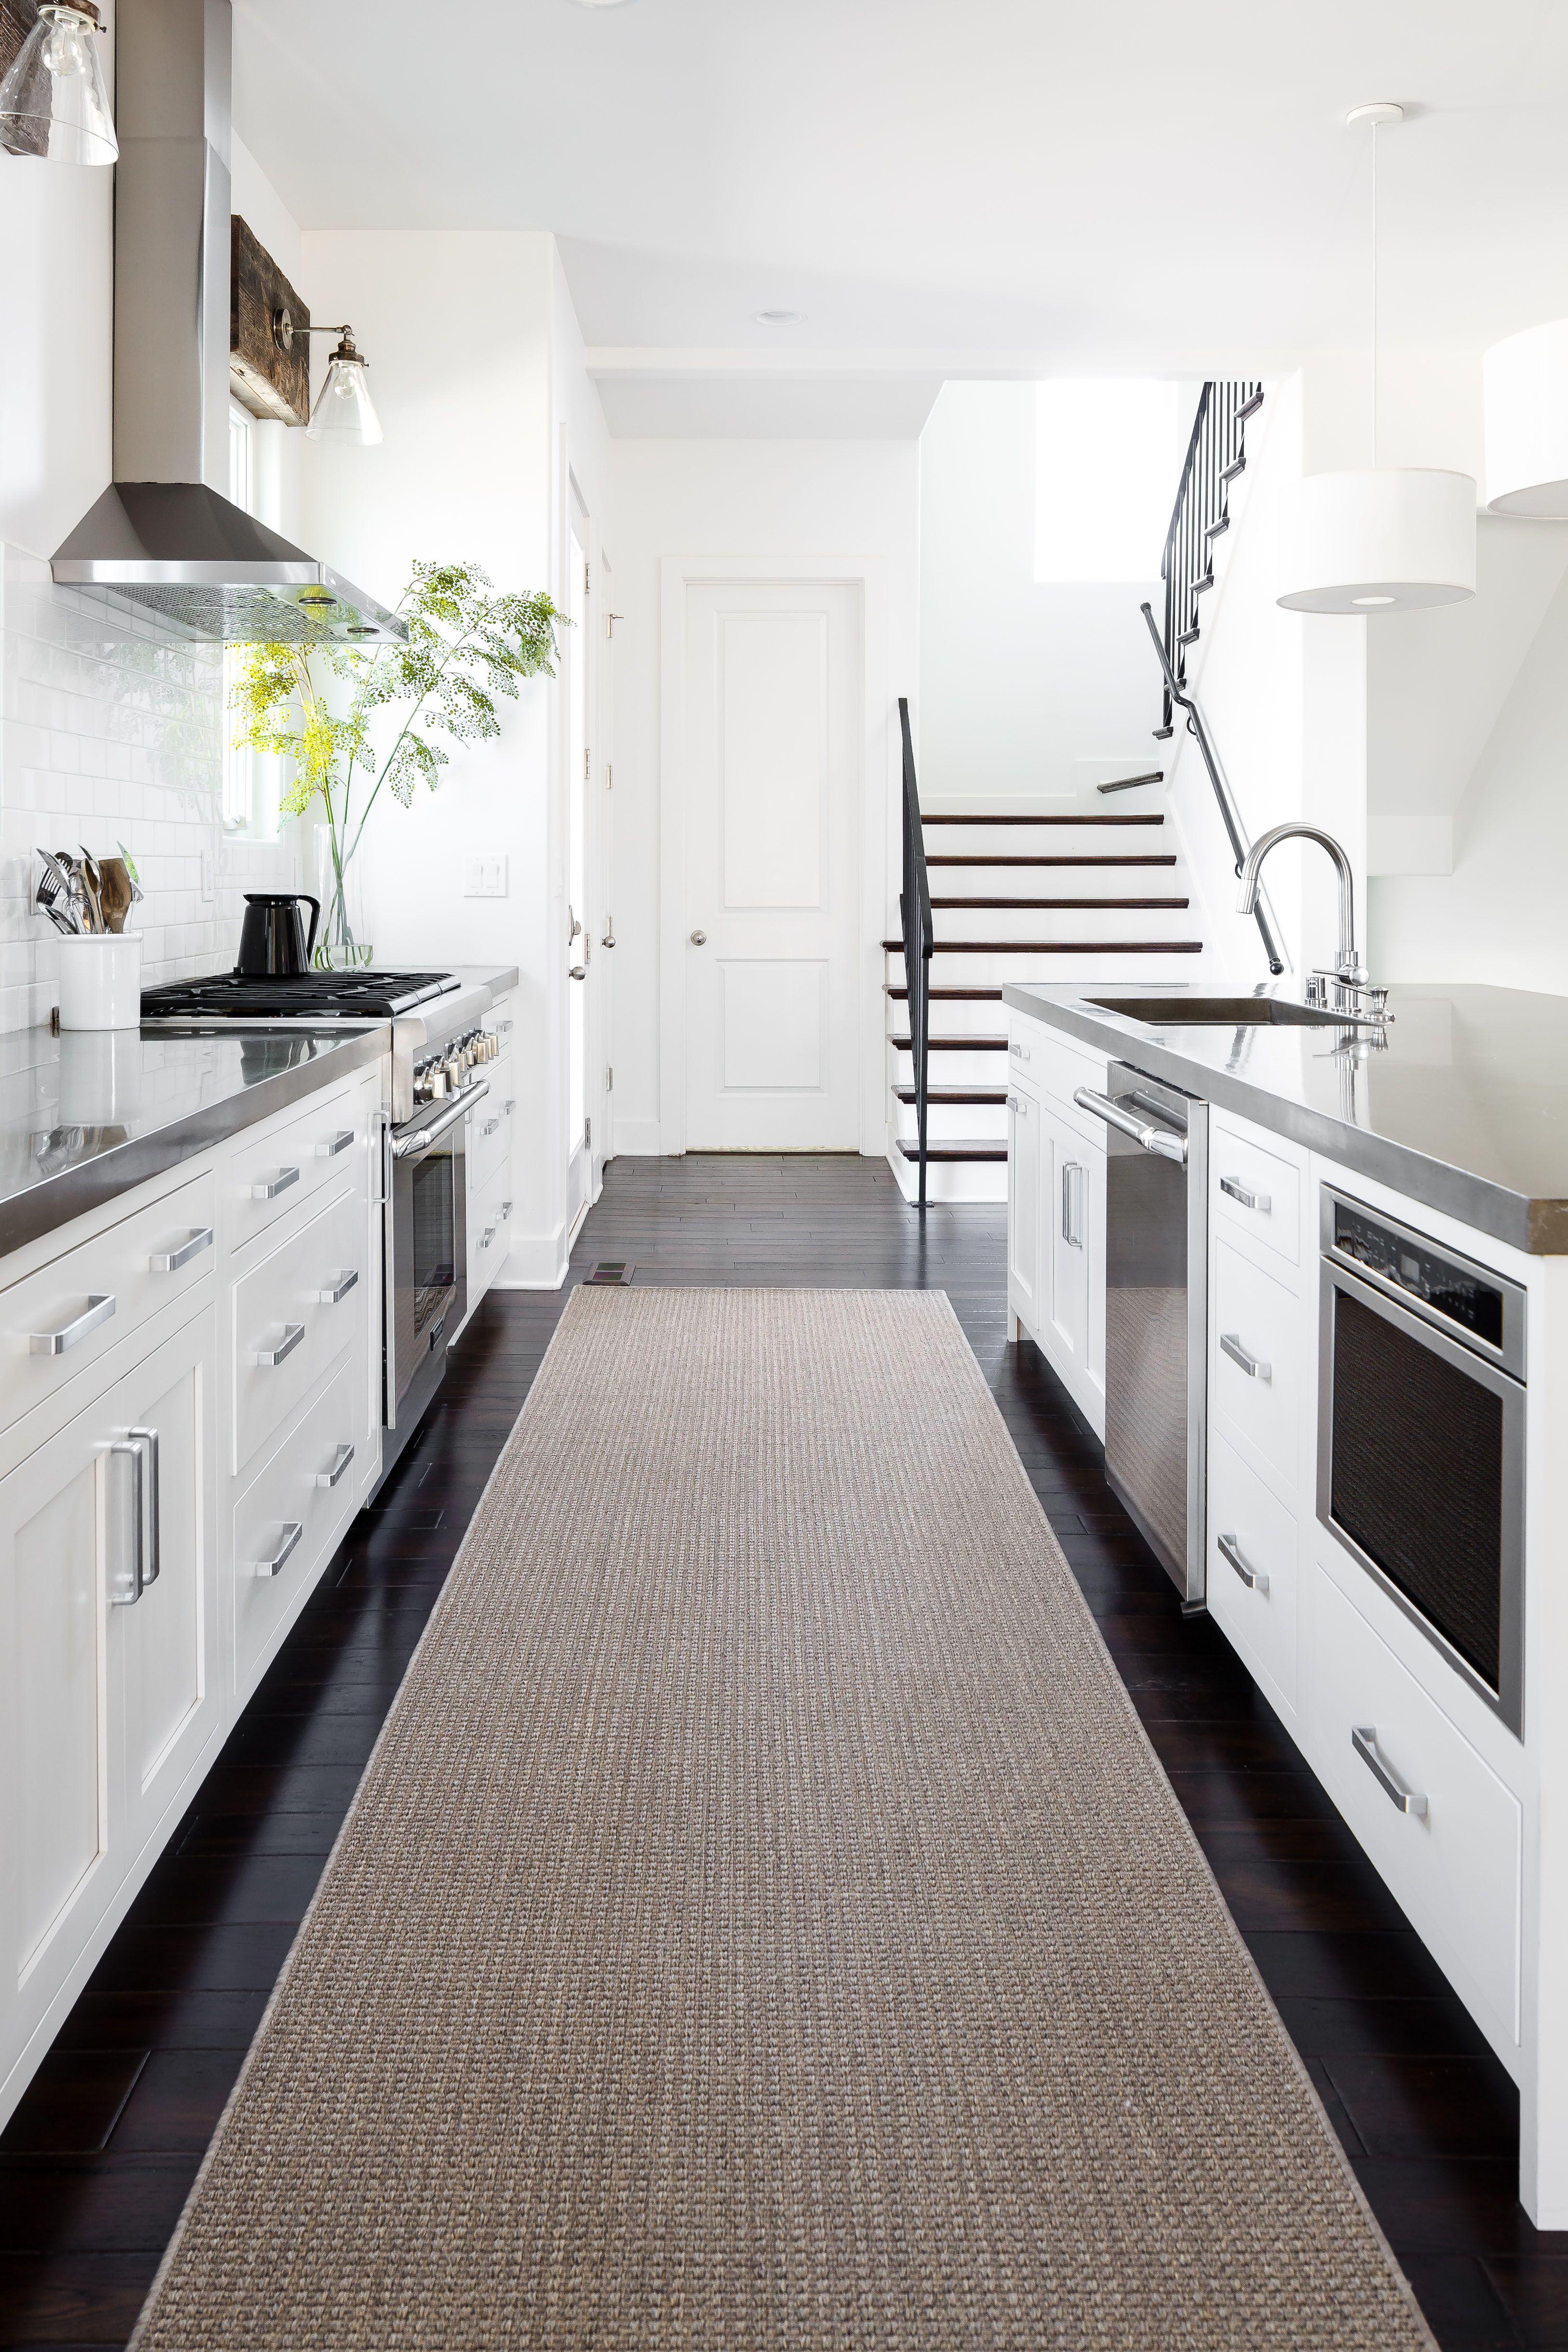 Sisal Runner - natural fibers - Fibreworks - kitchen | Room Scenes ...